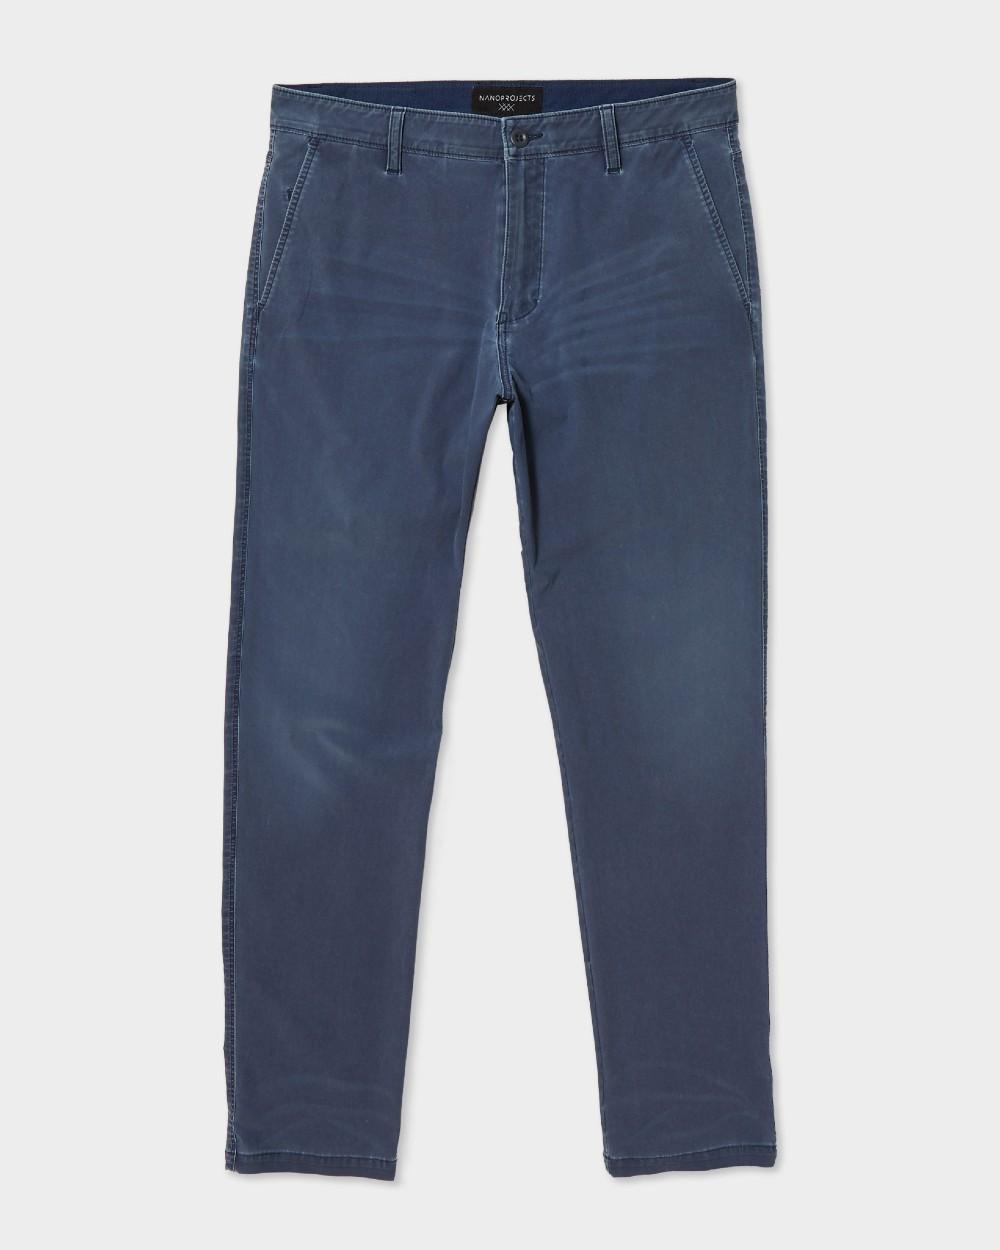 Men's indigo garment-dyed pants.